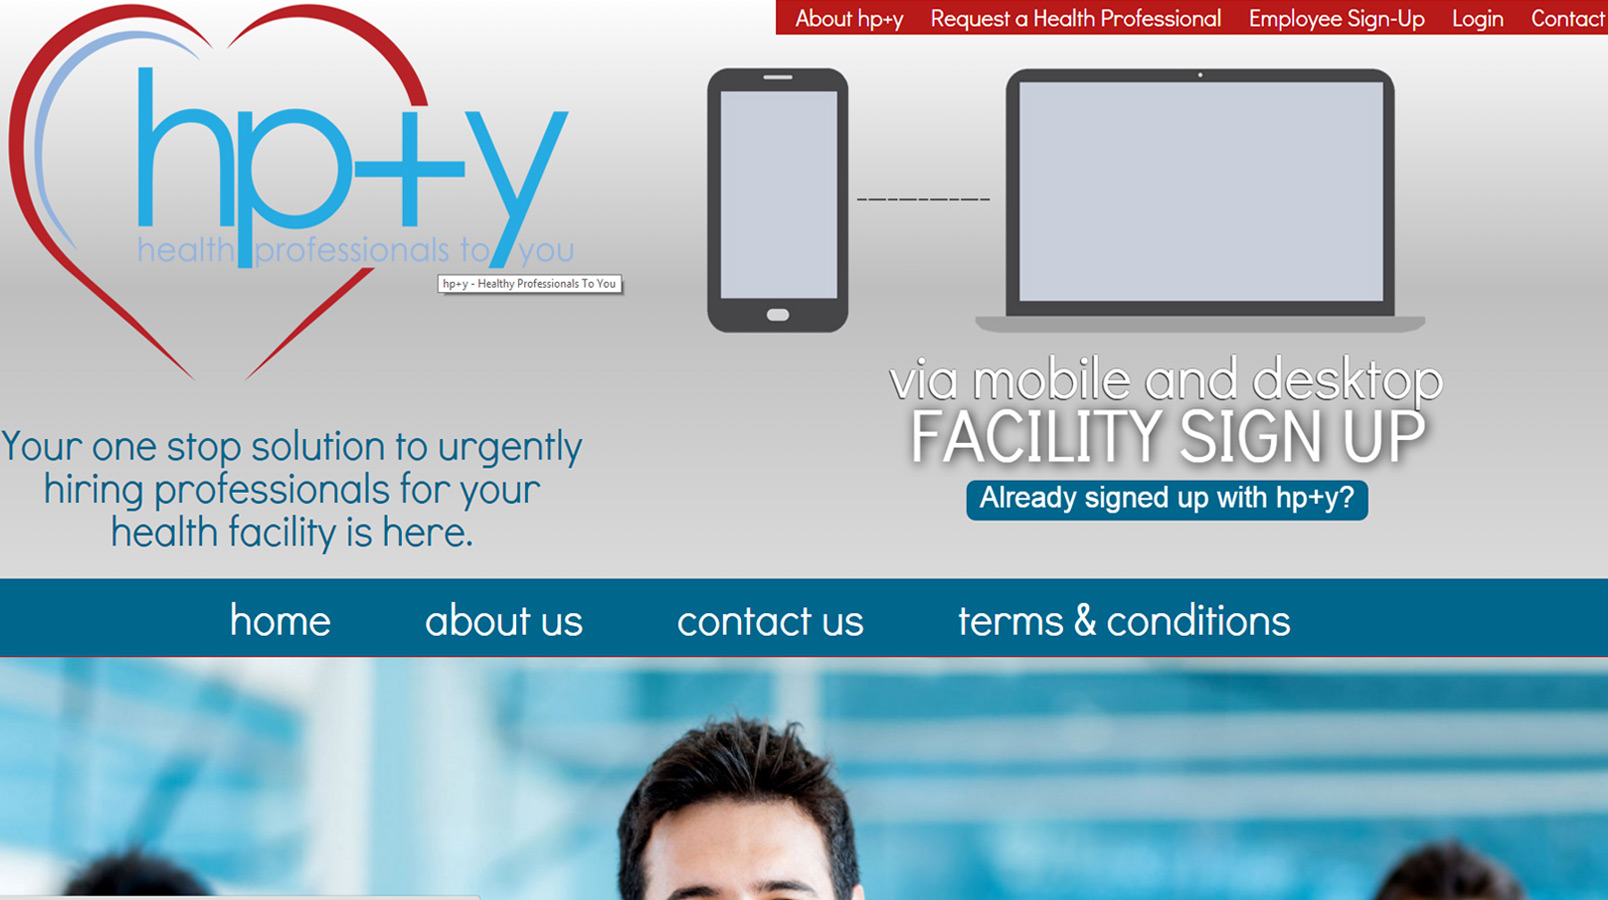 htpy website